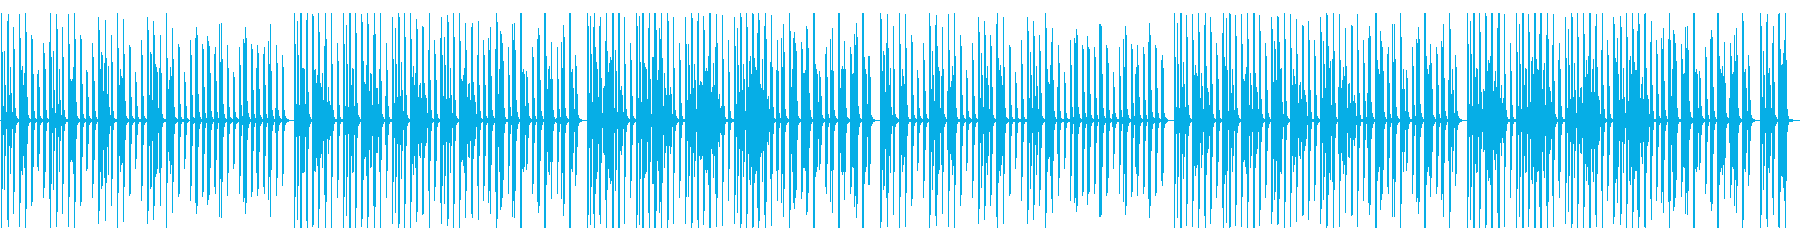 YouTube ピアノ・気だるいの再生済みの波形